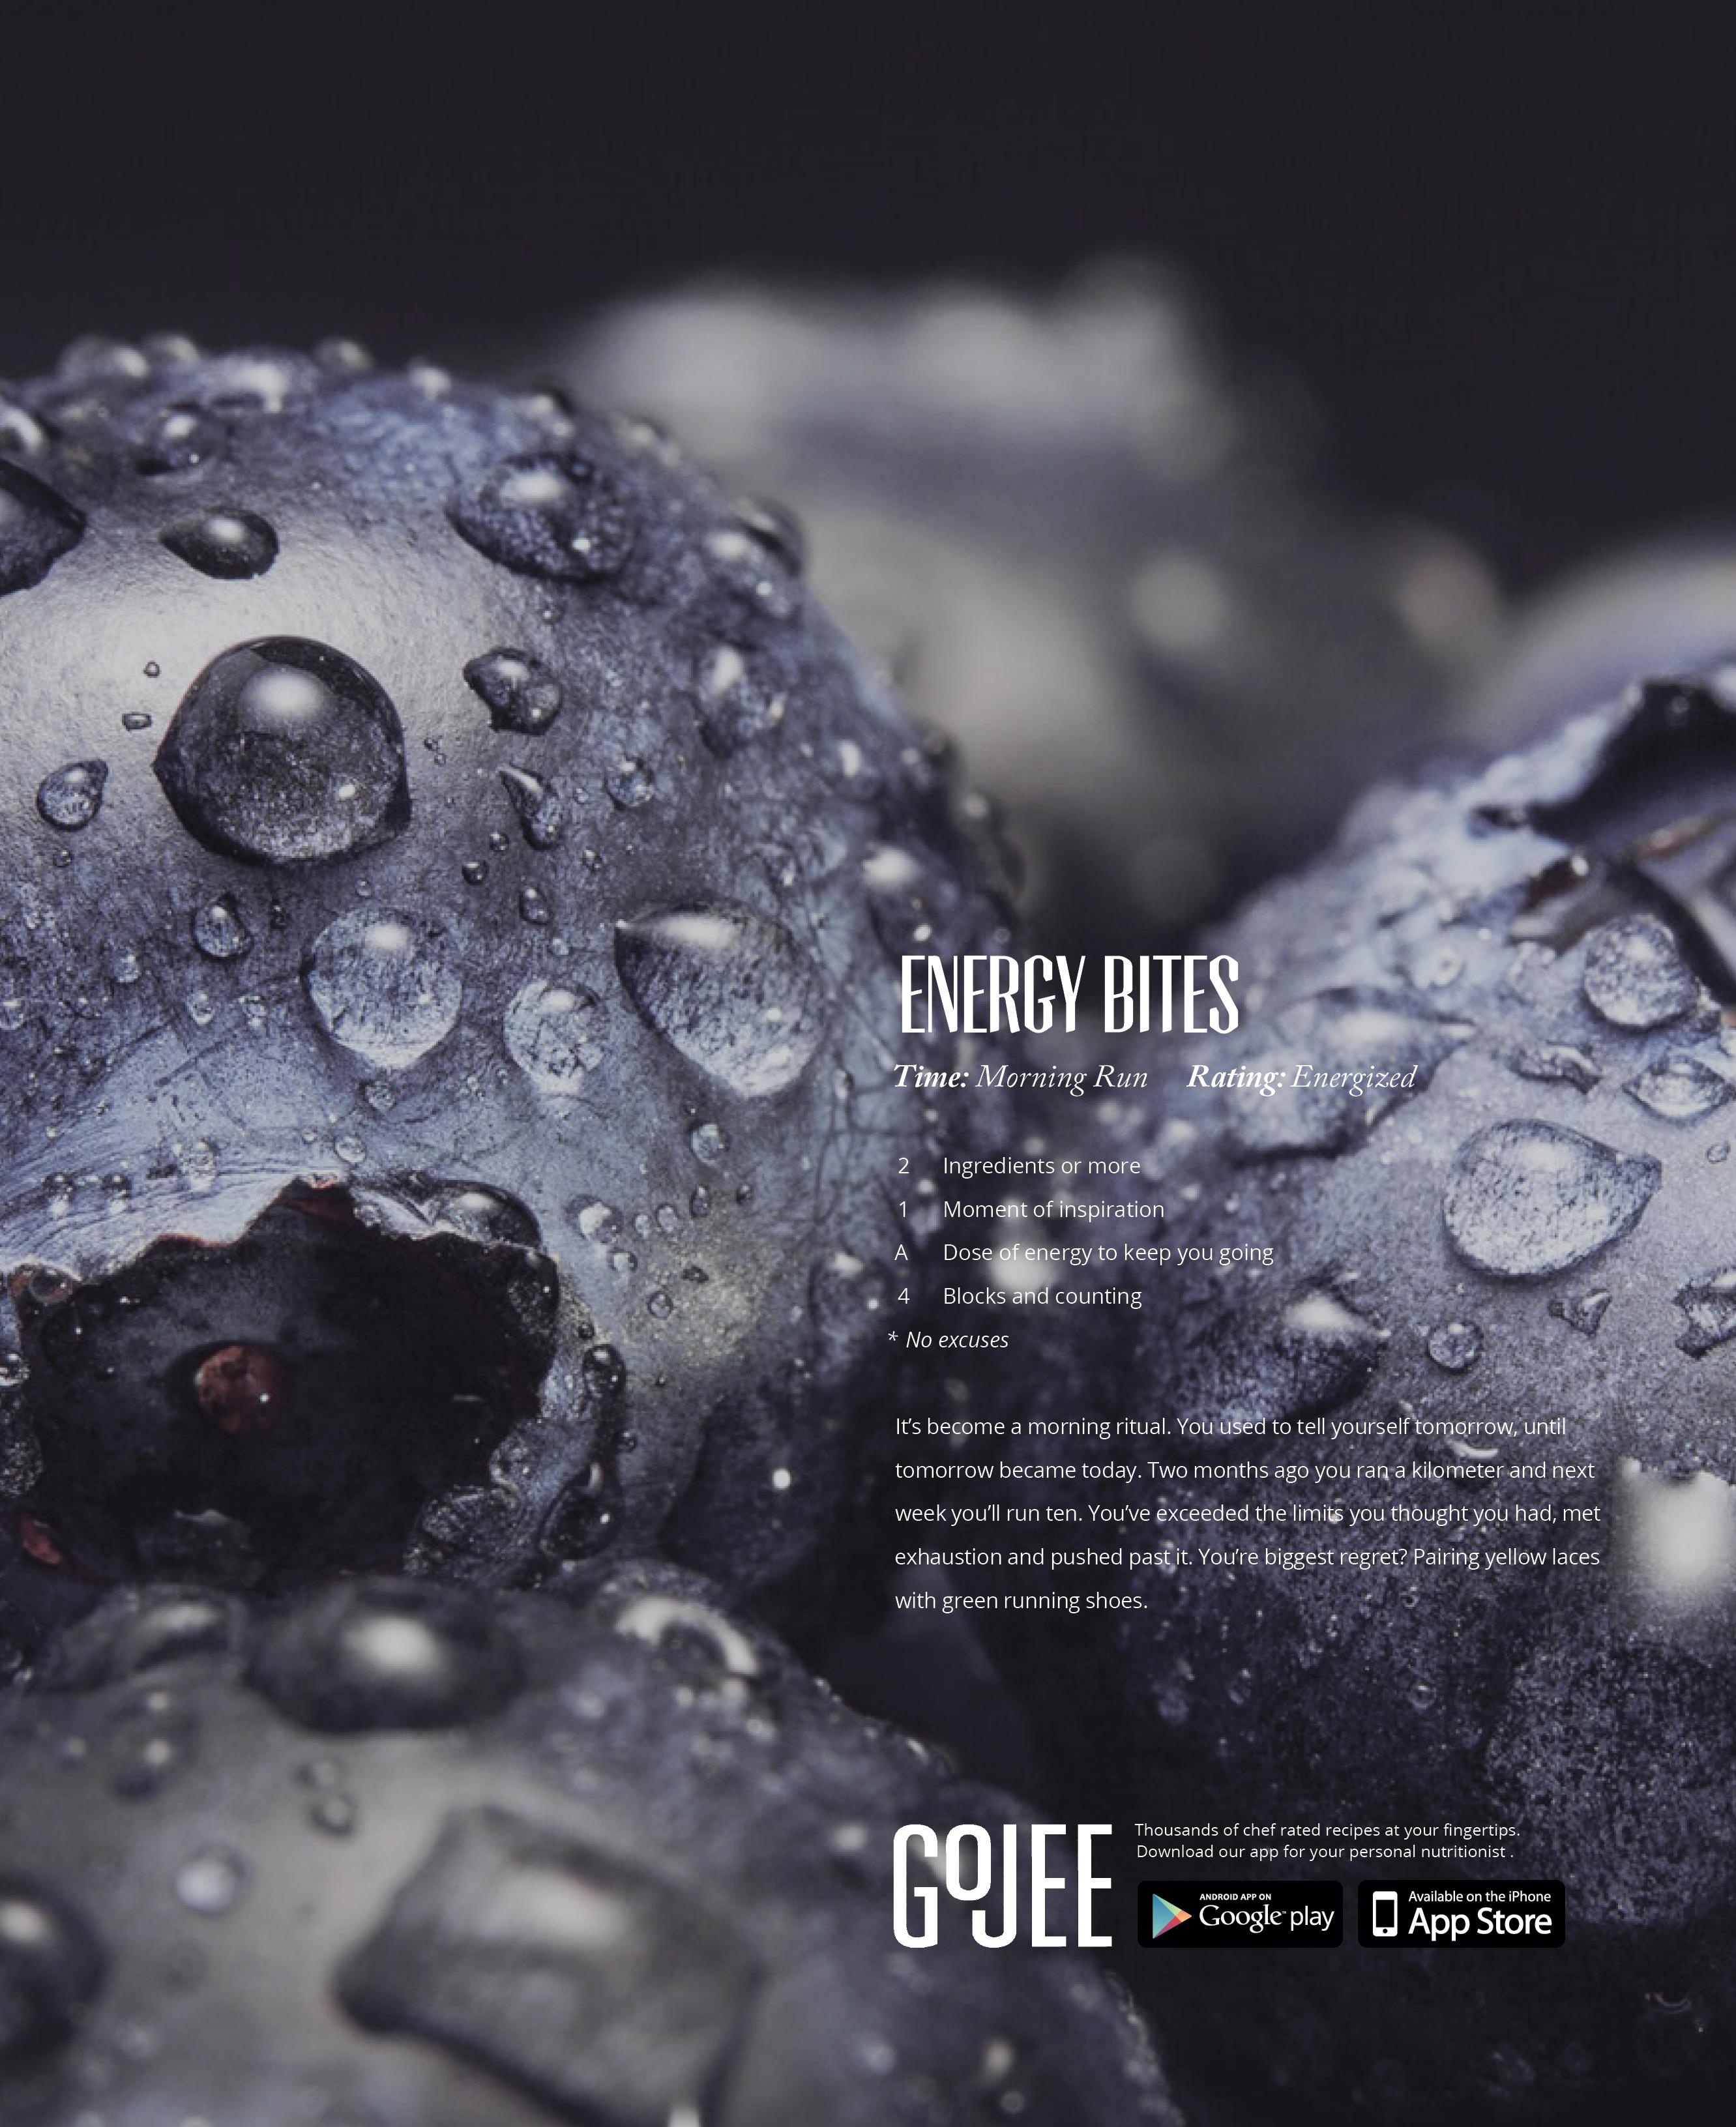 Gojee Magazine Ad, Additional Persona - Energy